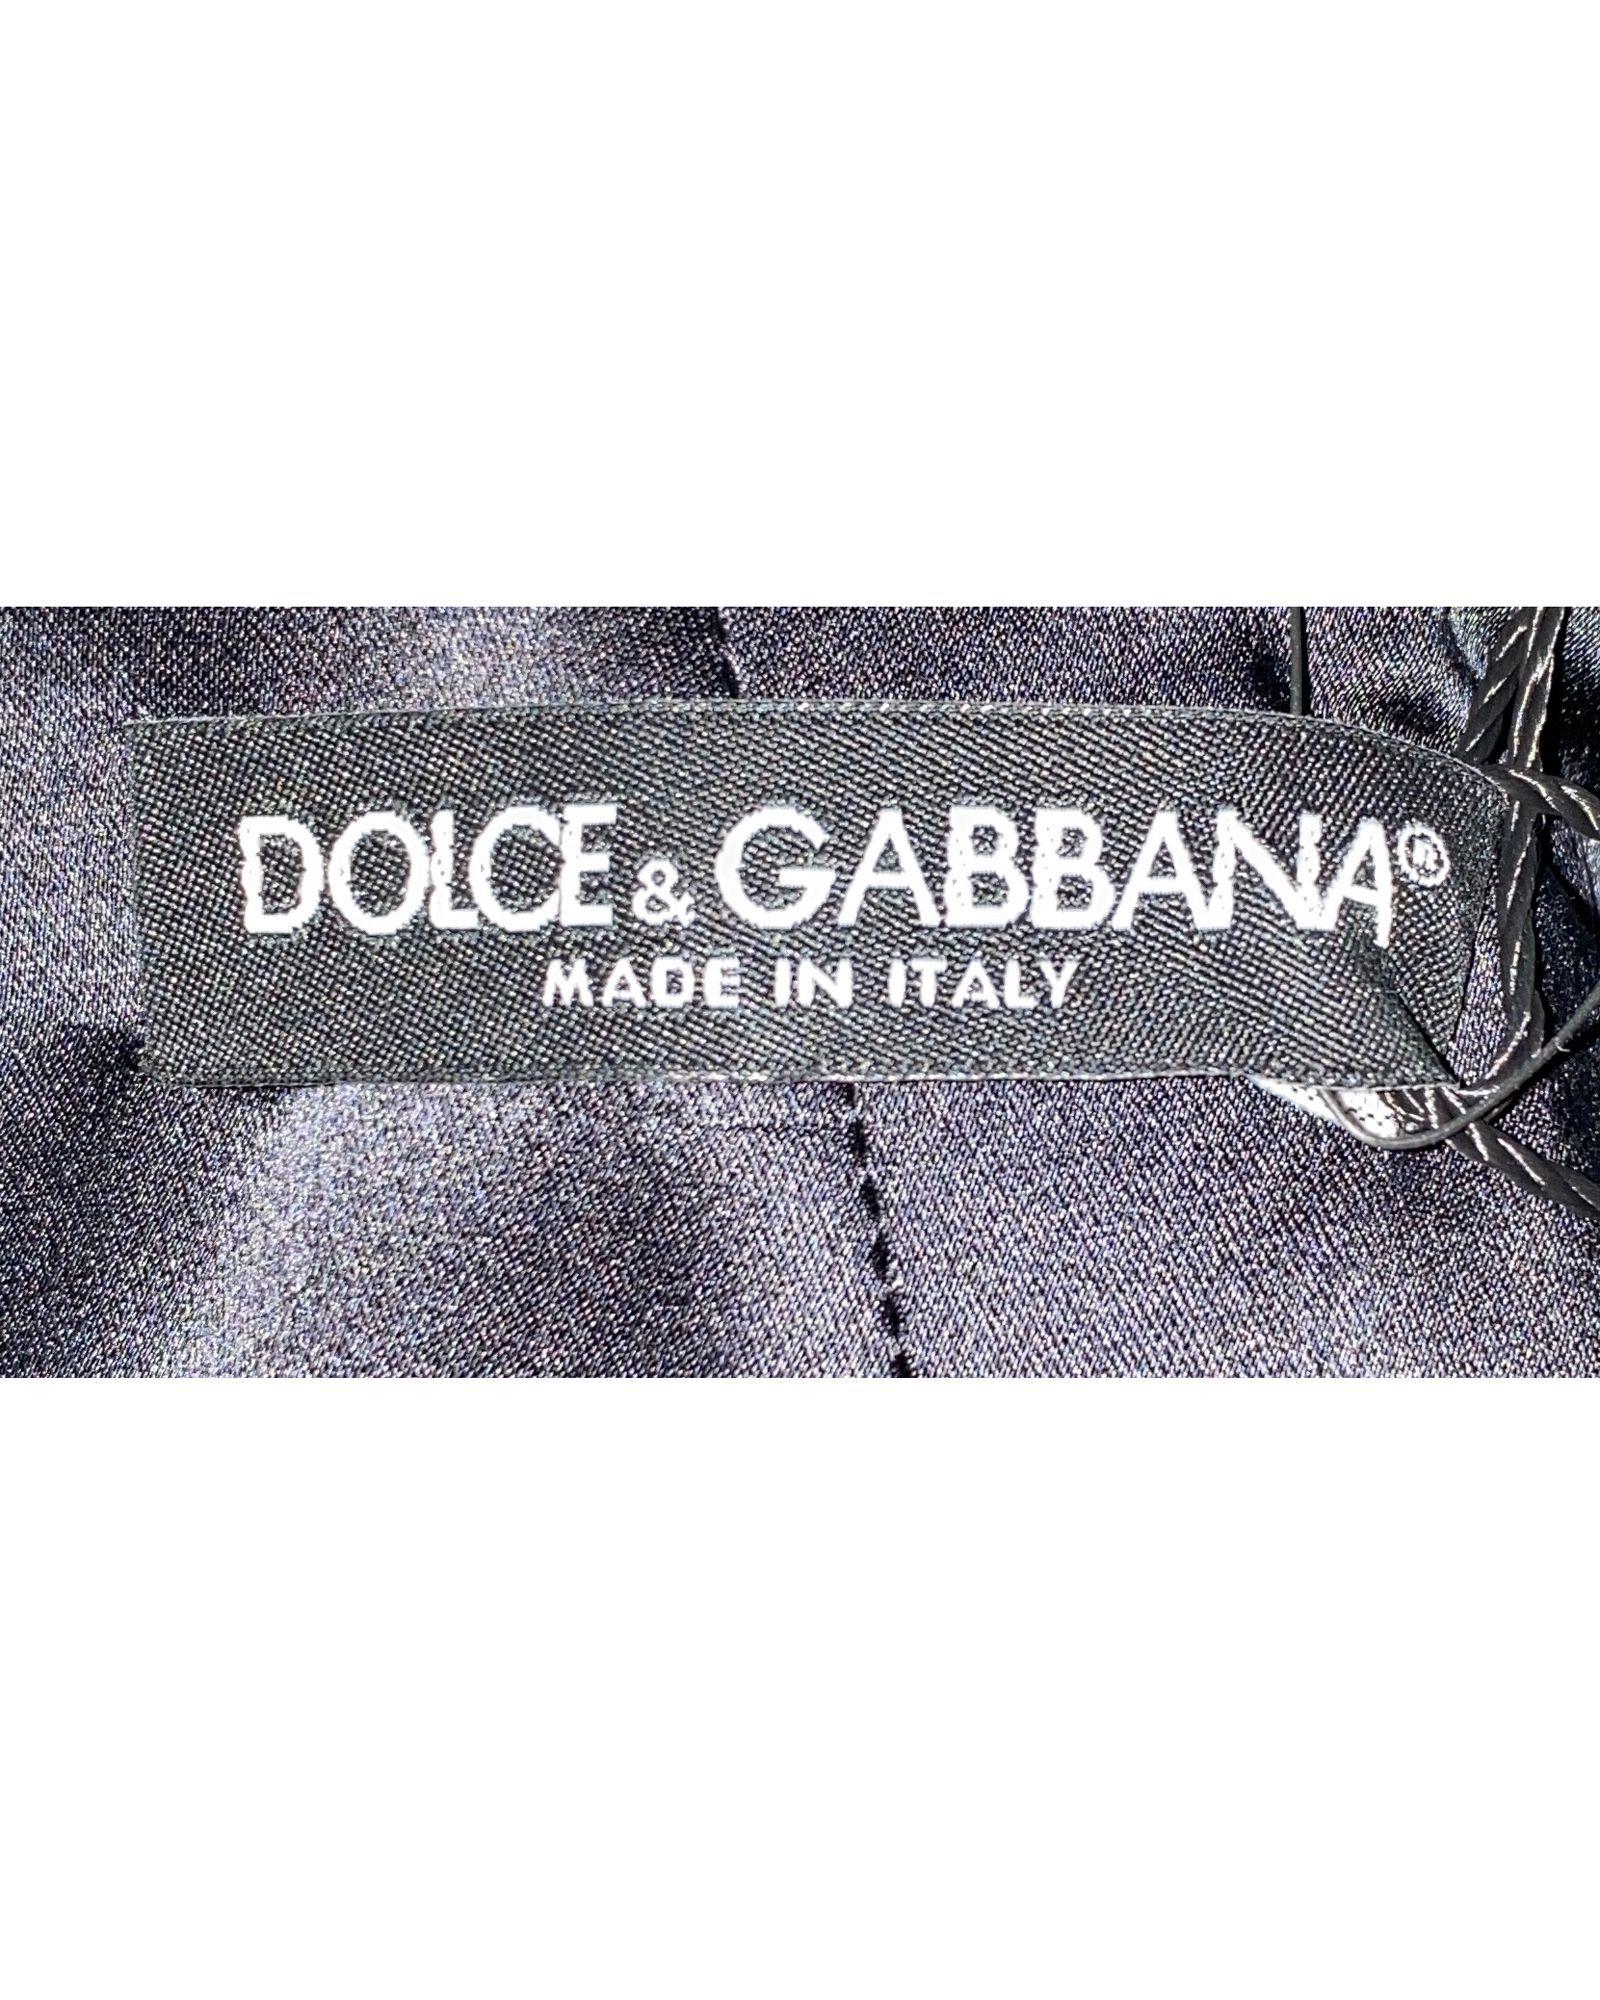 Dolce & Gabbana Check Tweed Dress